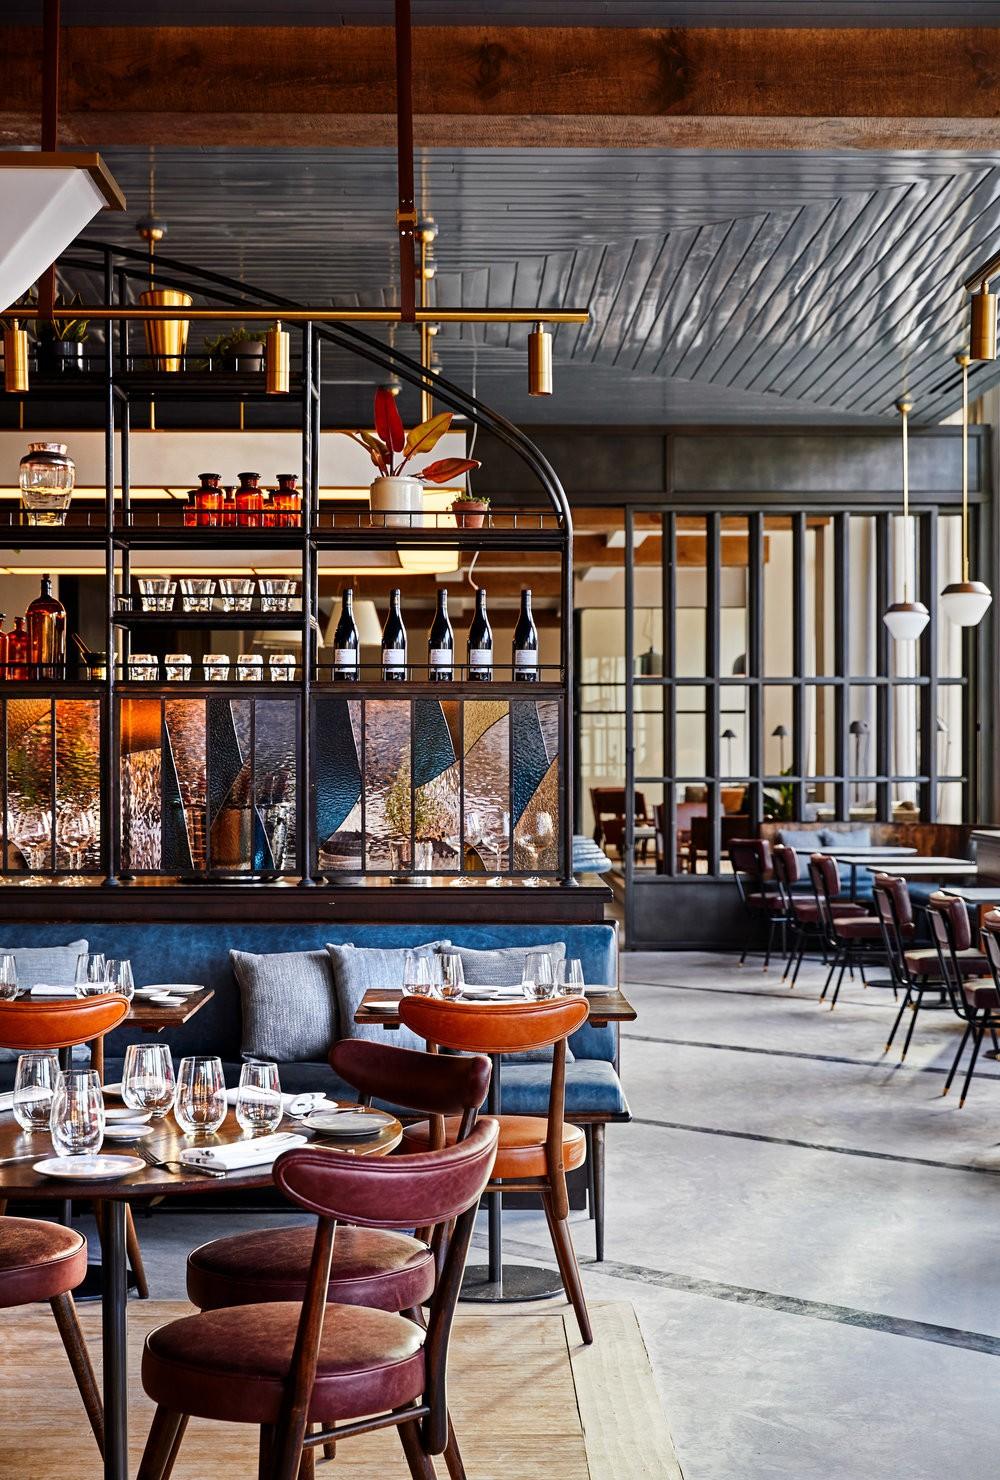 Forward-Thinking Design: Restaurants by Alexander Waterworth Interiors alexander waterworth interiors Forward-Thinking Design: Restaurants by Alexander Waterworth Interiors 2 Bespoke Glass